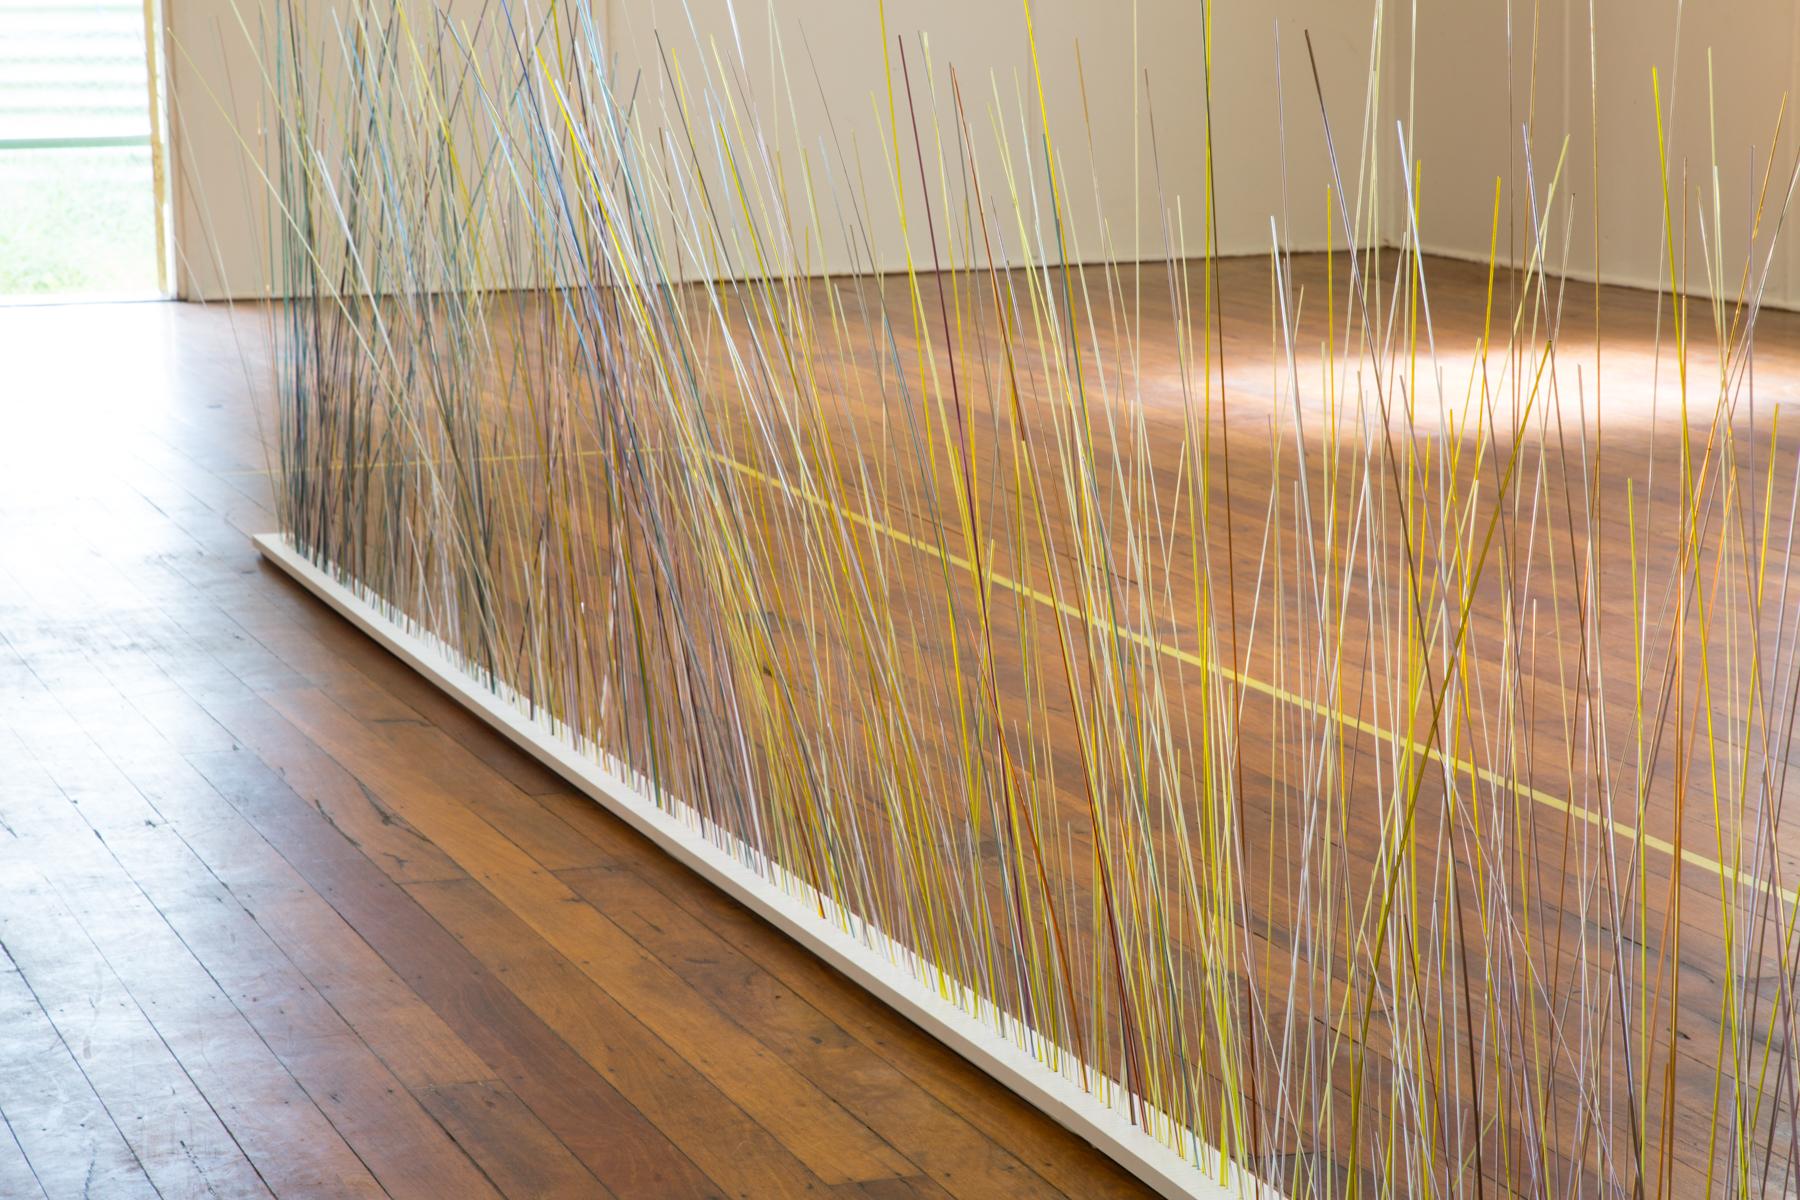 Hannah Gason,  Watching, waiting , 2017, hot formed glass, wood, 120 x 480 x 70 cm. Photos: Wendy Dawes.